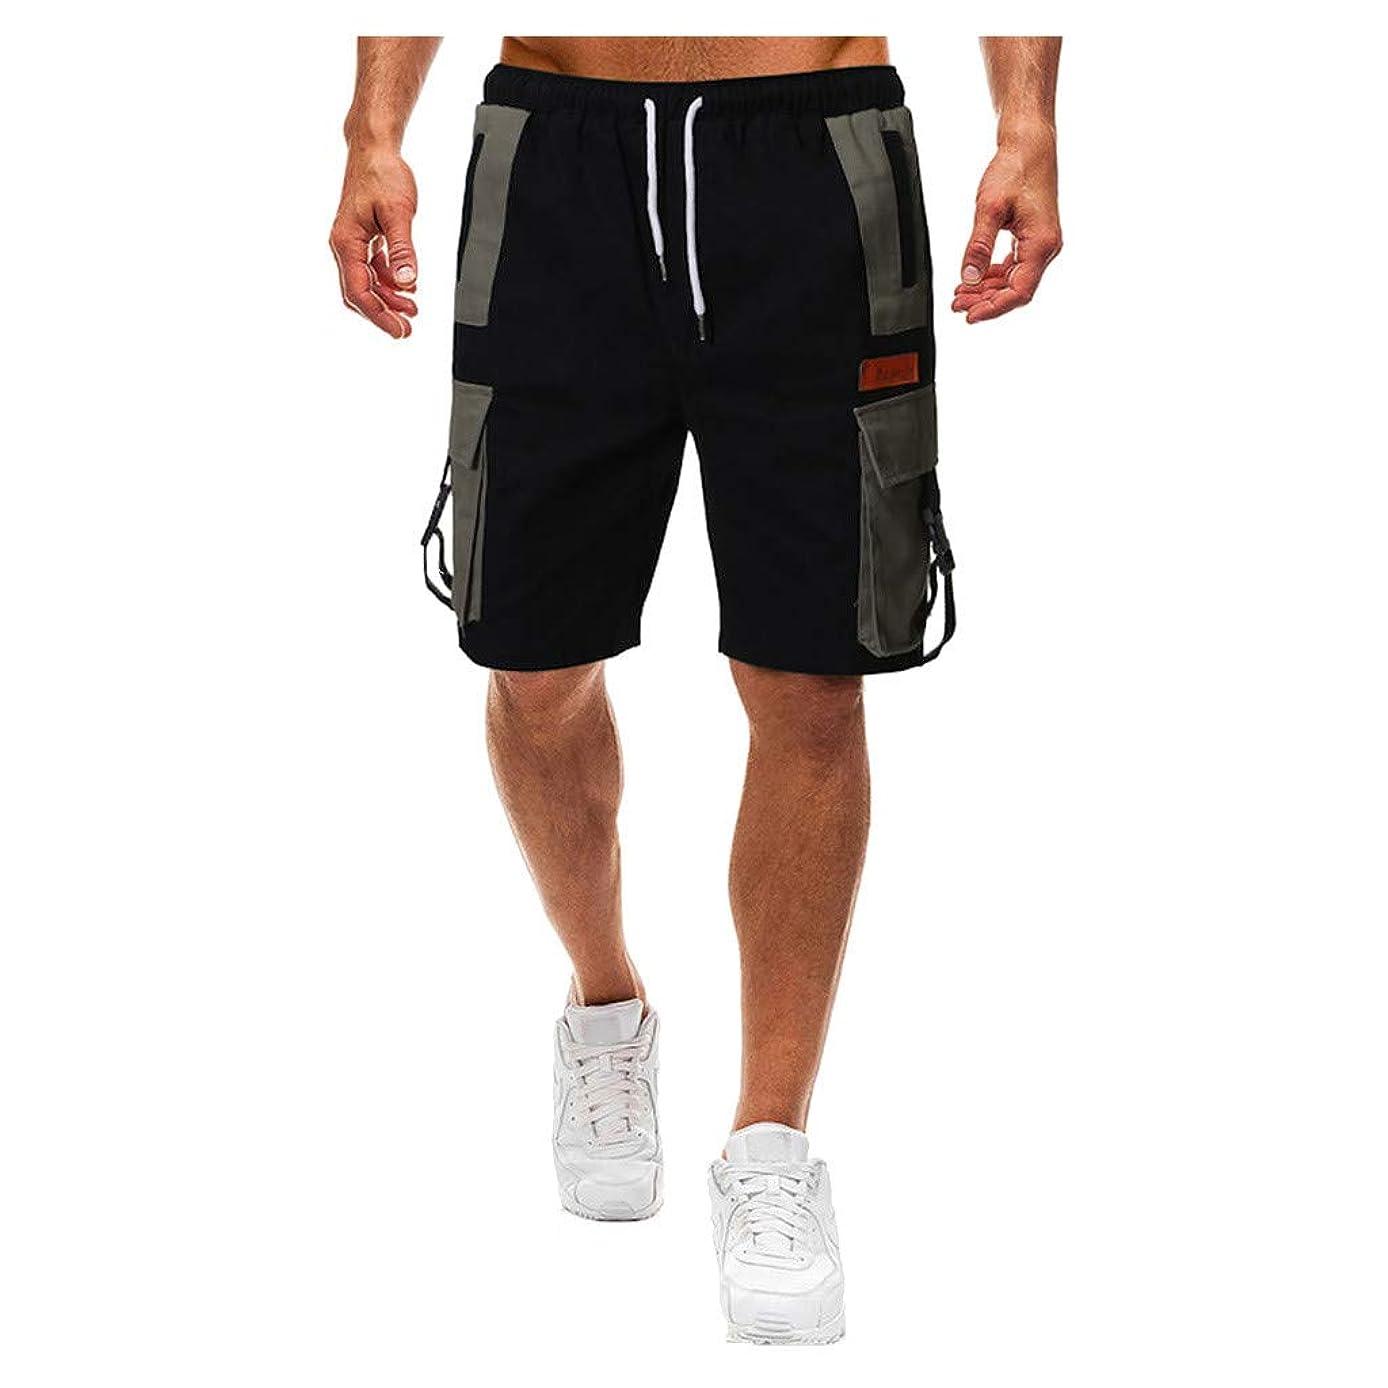 Men's Twill Cargo Shorts,Multi Pocket Loose Fit Cotton Outdoor Sport Short Combat Pants for Men